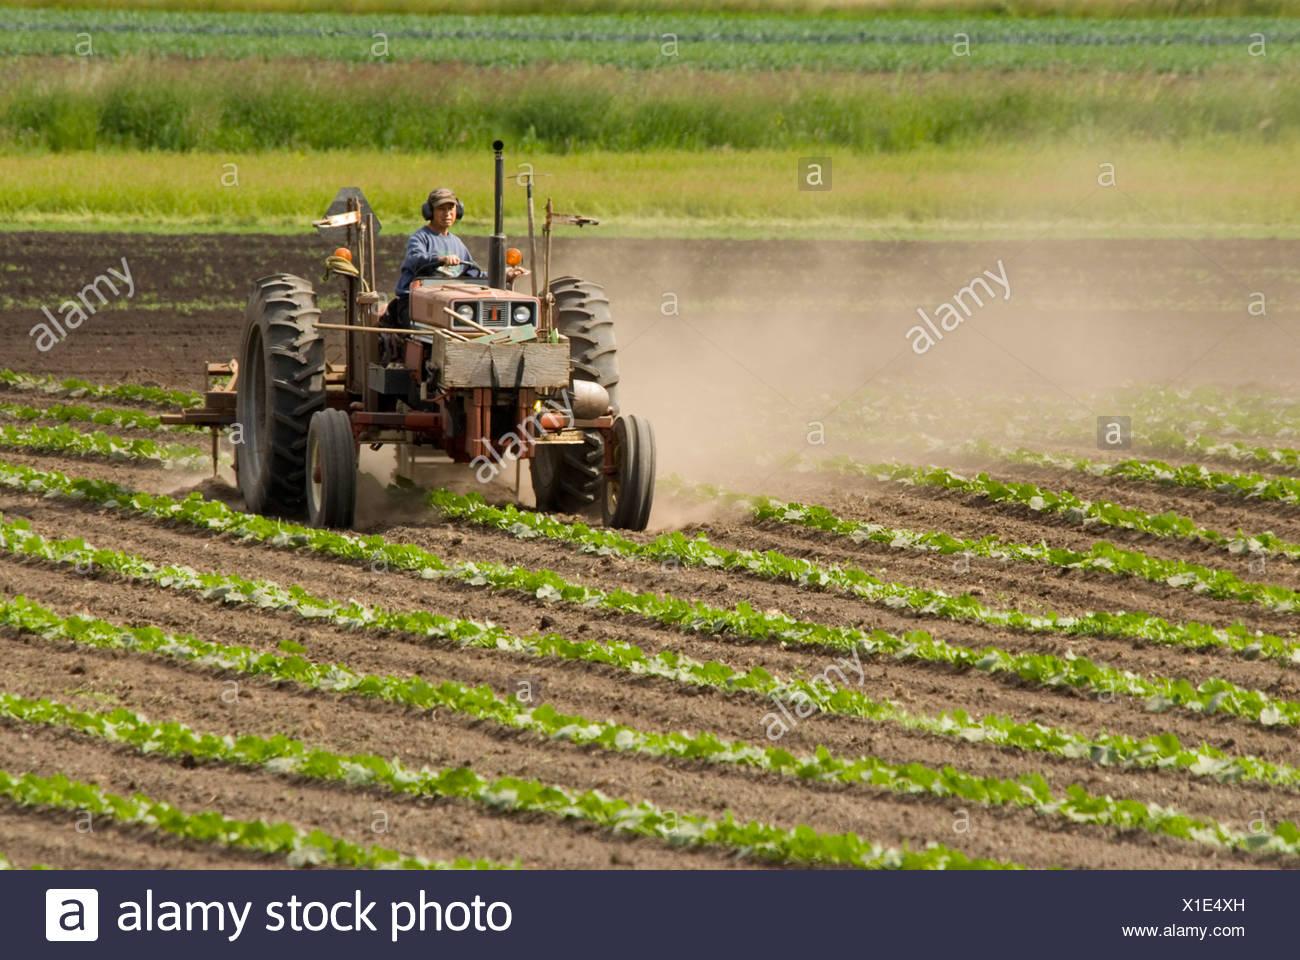 farmer driving tractor, saanich peninsula, british columbia, canada. - Stock Image